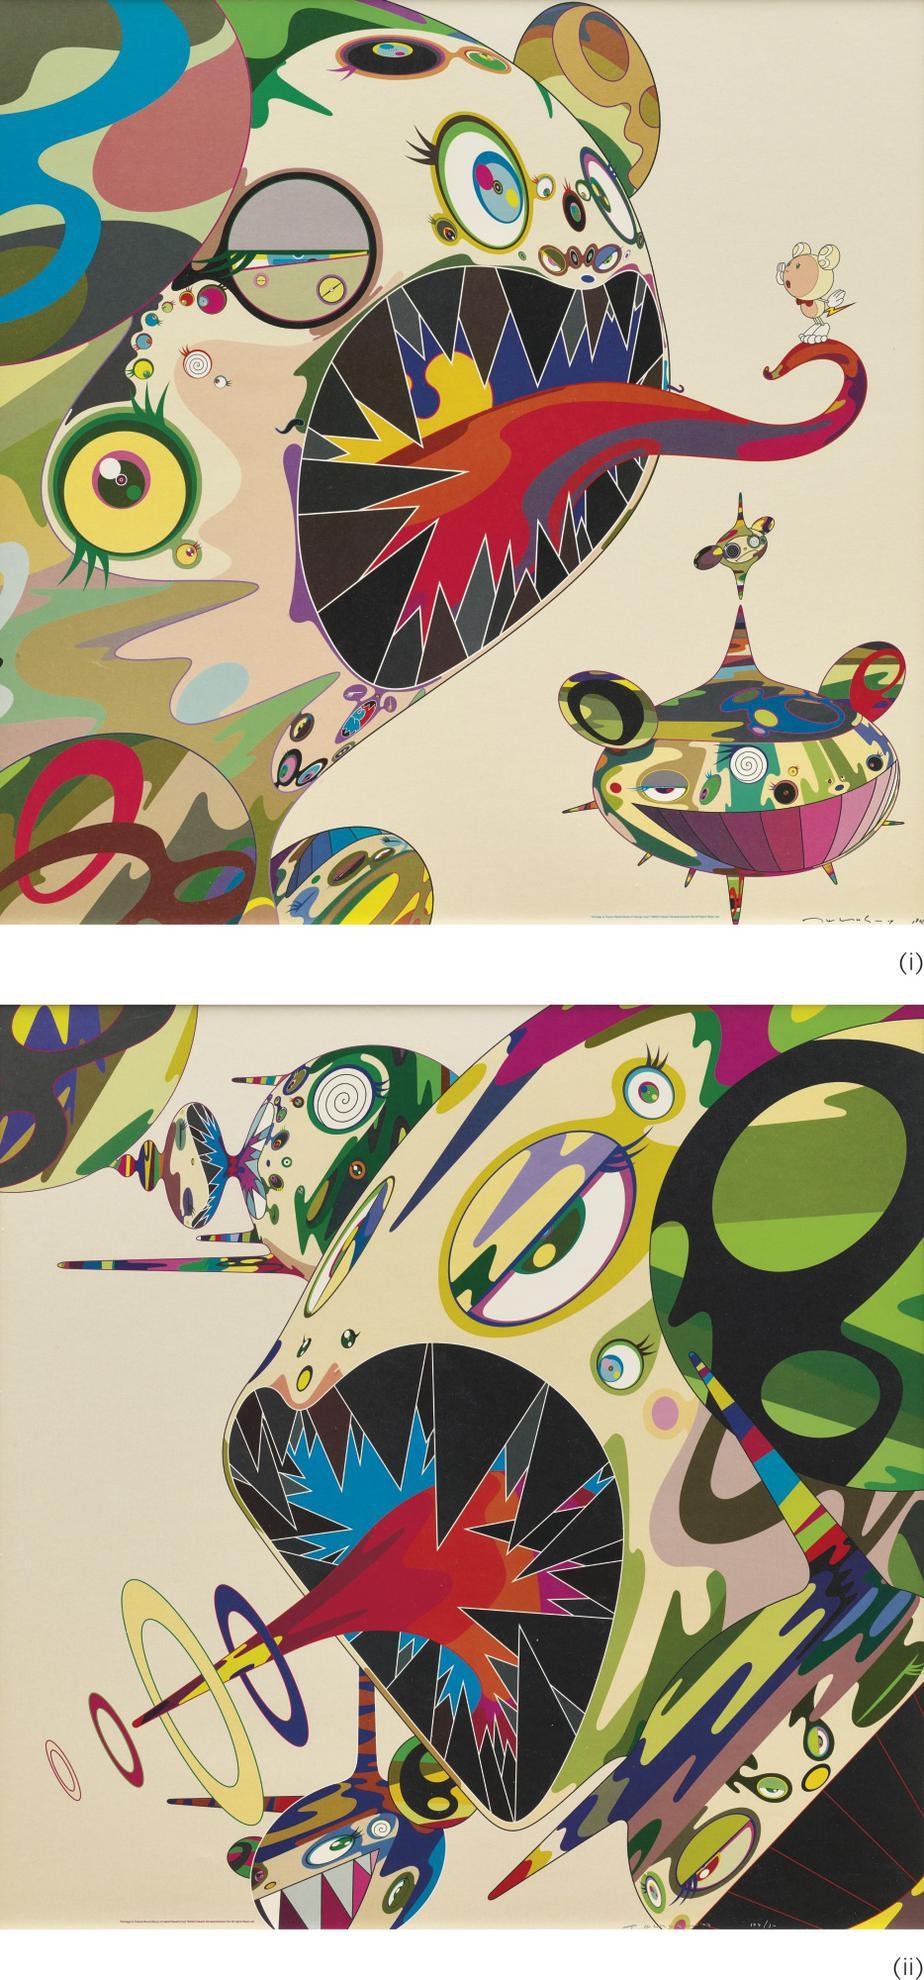 Takashi Murakami-Homage To Francis Bacon: (i) Study Of George Dyer/ (ii) Study Of Isabel Rawsthorne) (Two Works)-2003